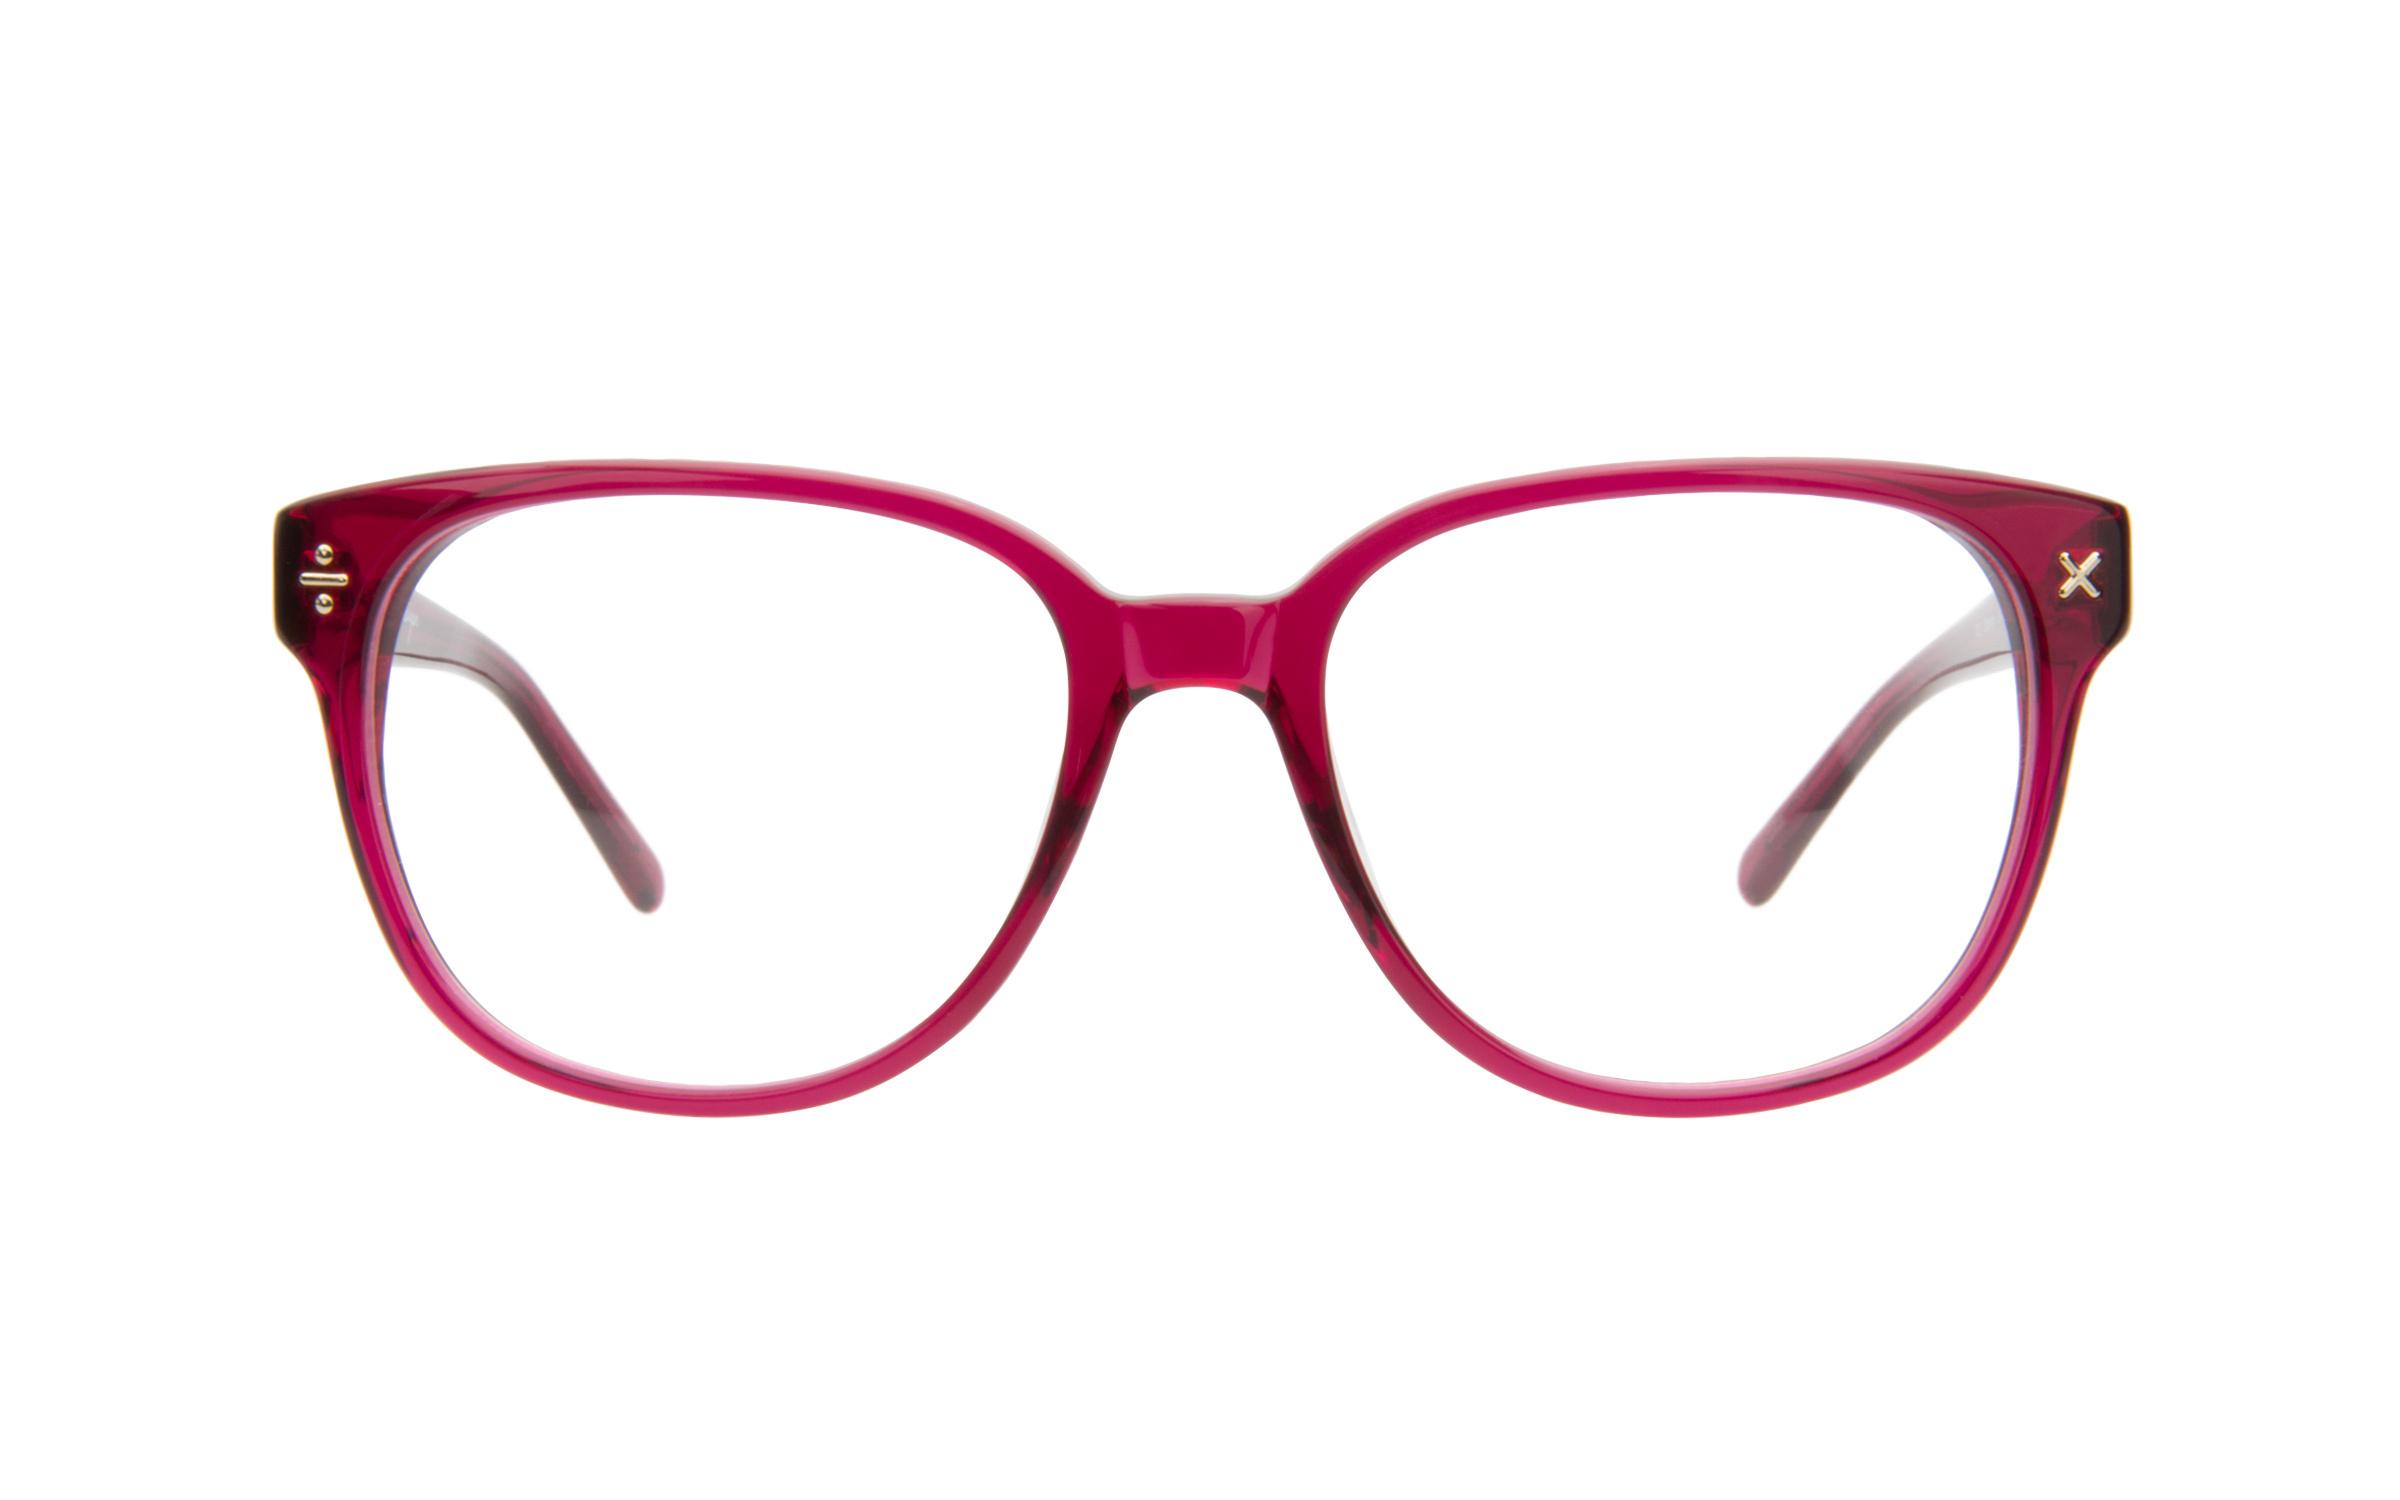 Derek_Cardigan_Womens_Glasses_Red_Acetate_Online_Coastal